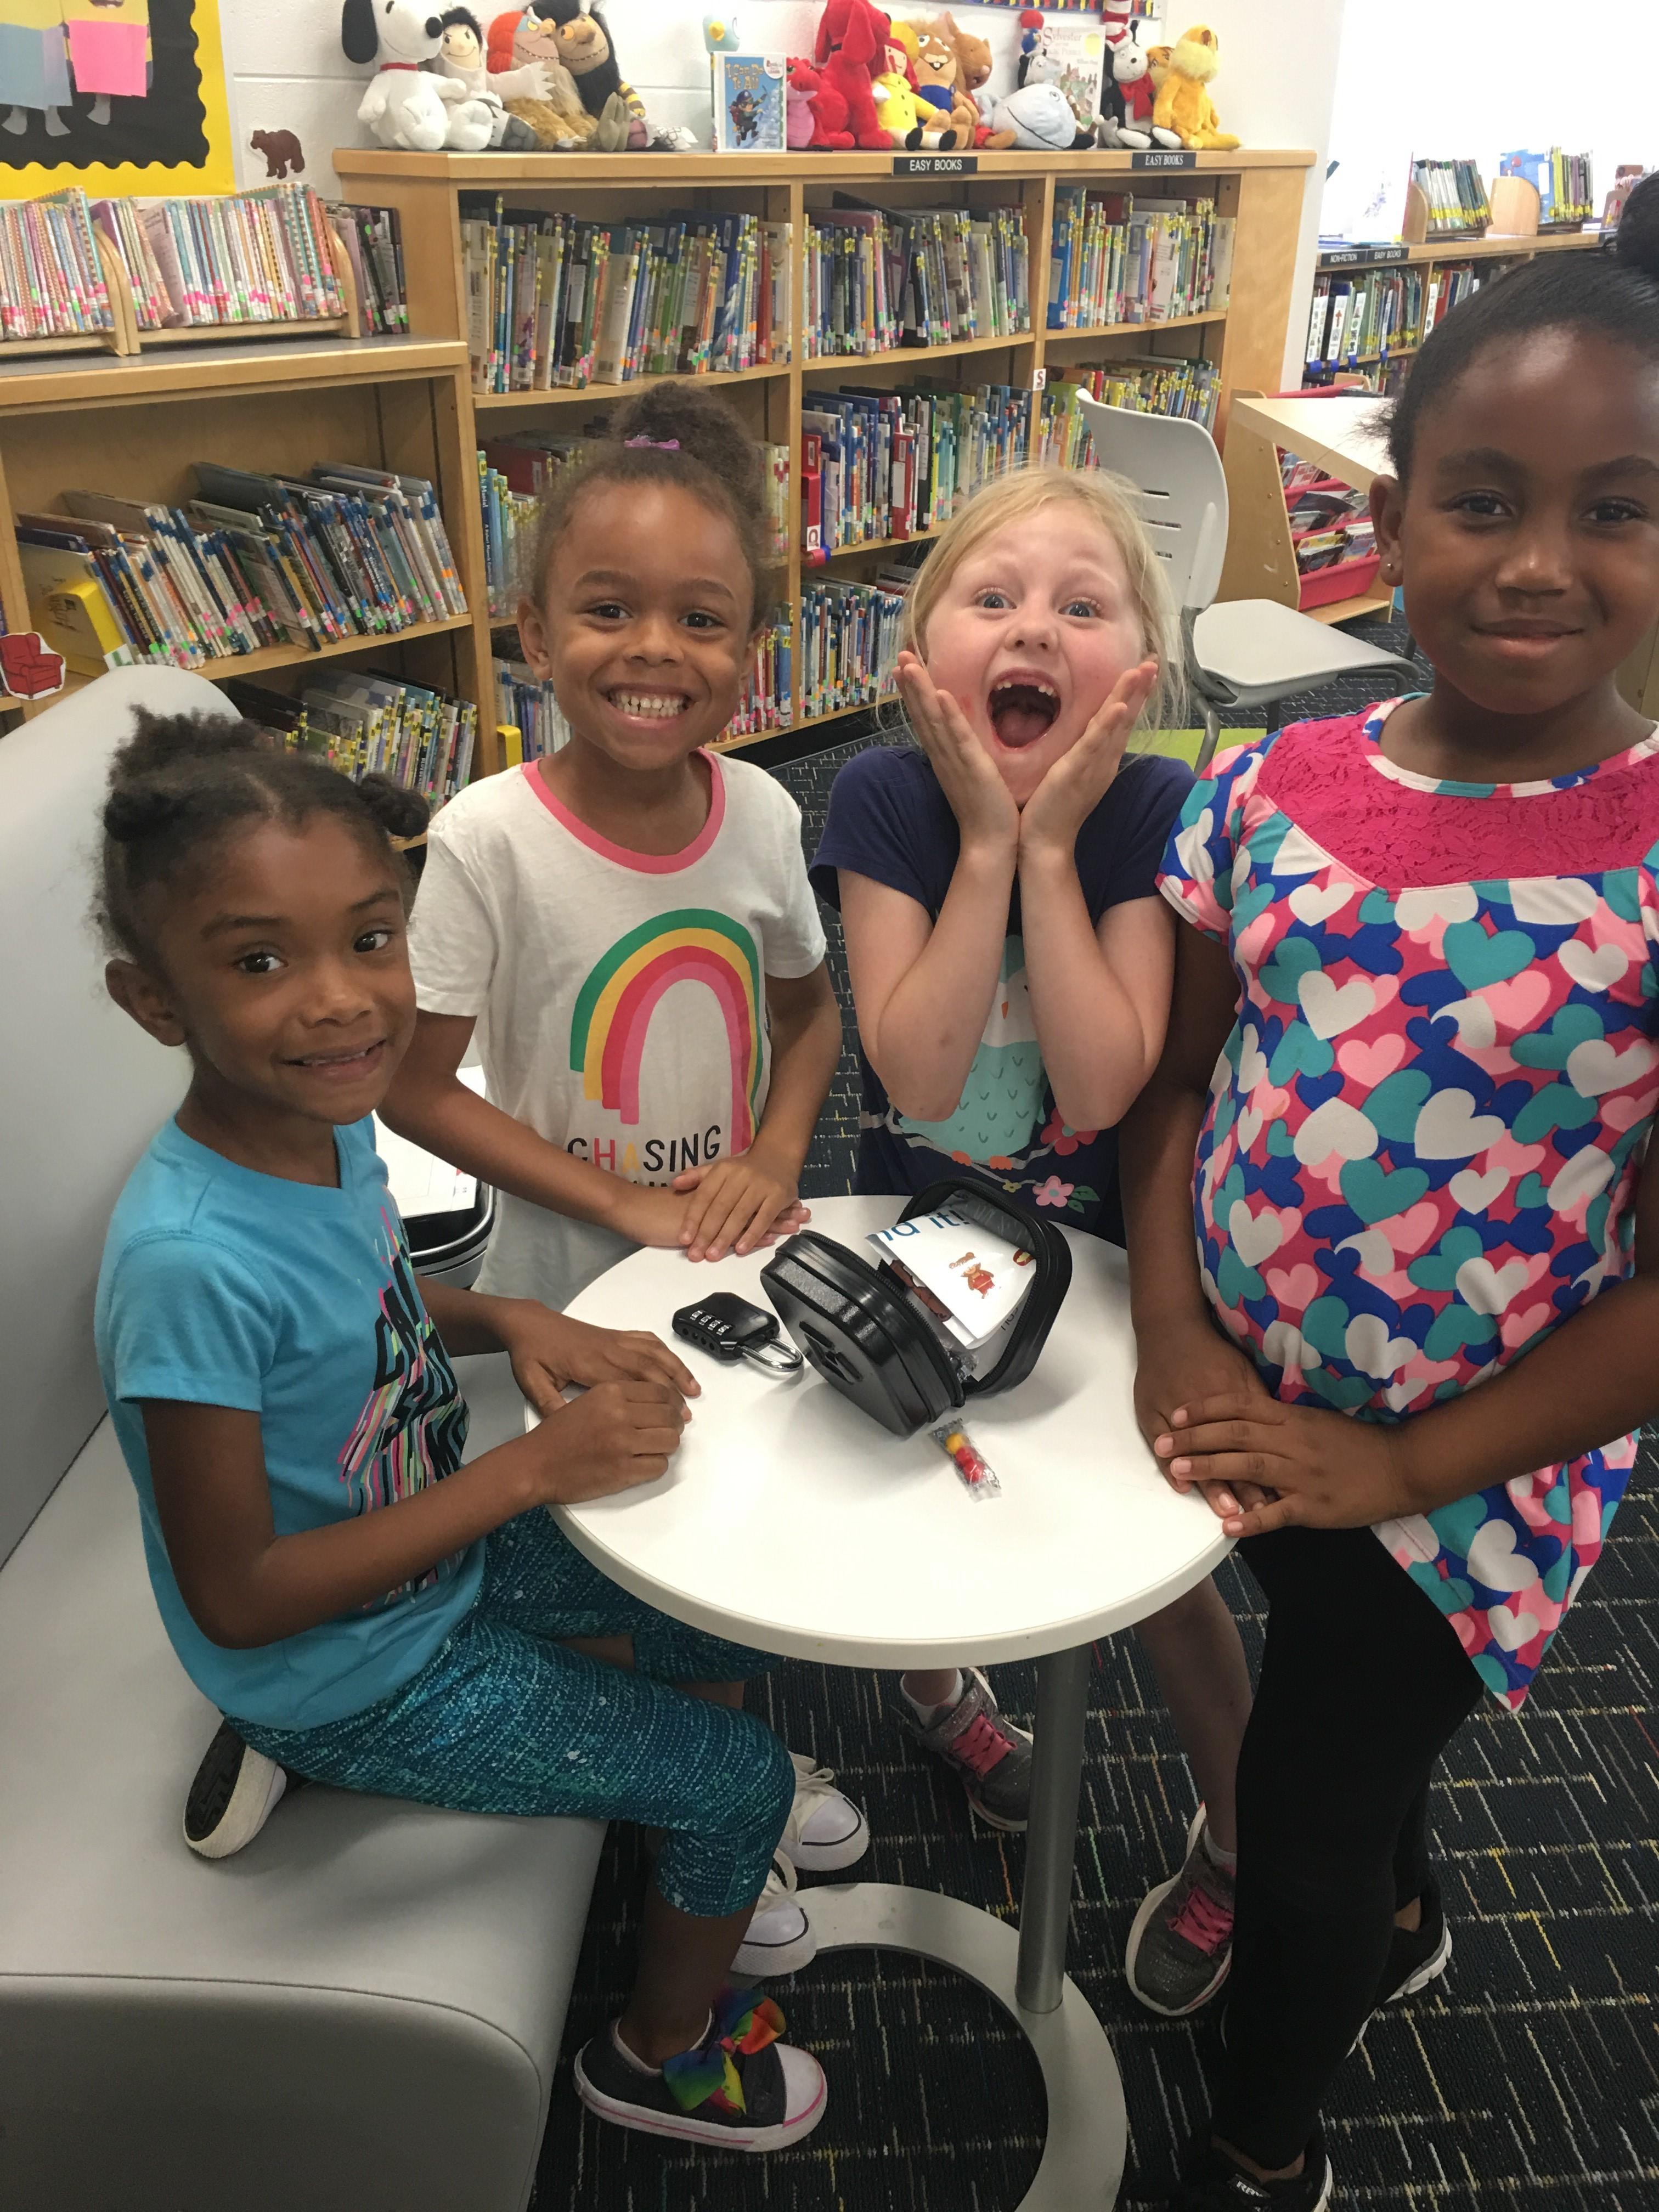 Kaylena Merritt, Na'Riya Kelly, Grace Fisher and Jordan Craddock are first graders at Corporate Landing Elementary School.